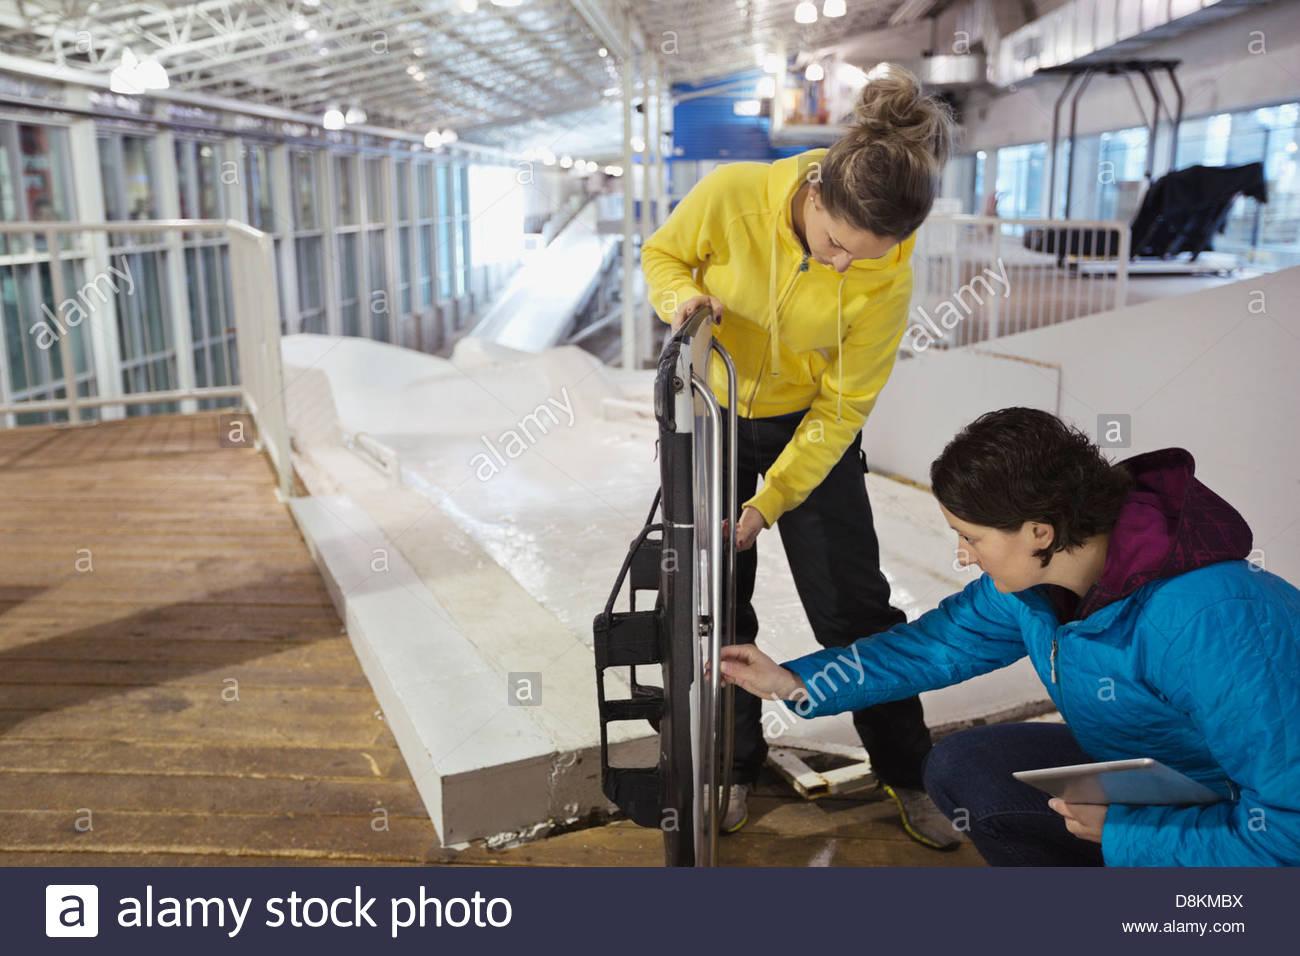 Female skeleton athlete with coach inspecting sled on track - Stock Image